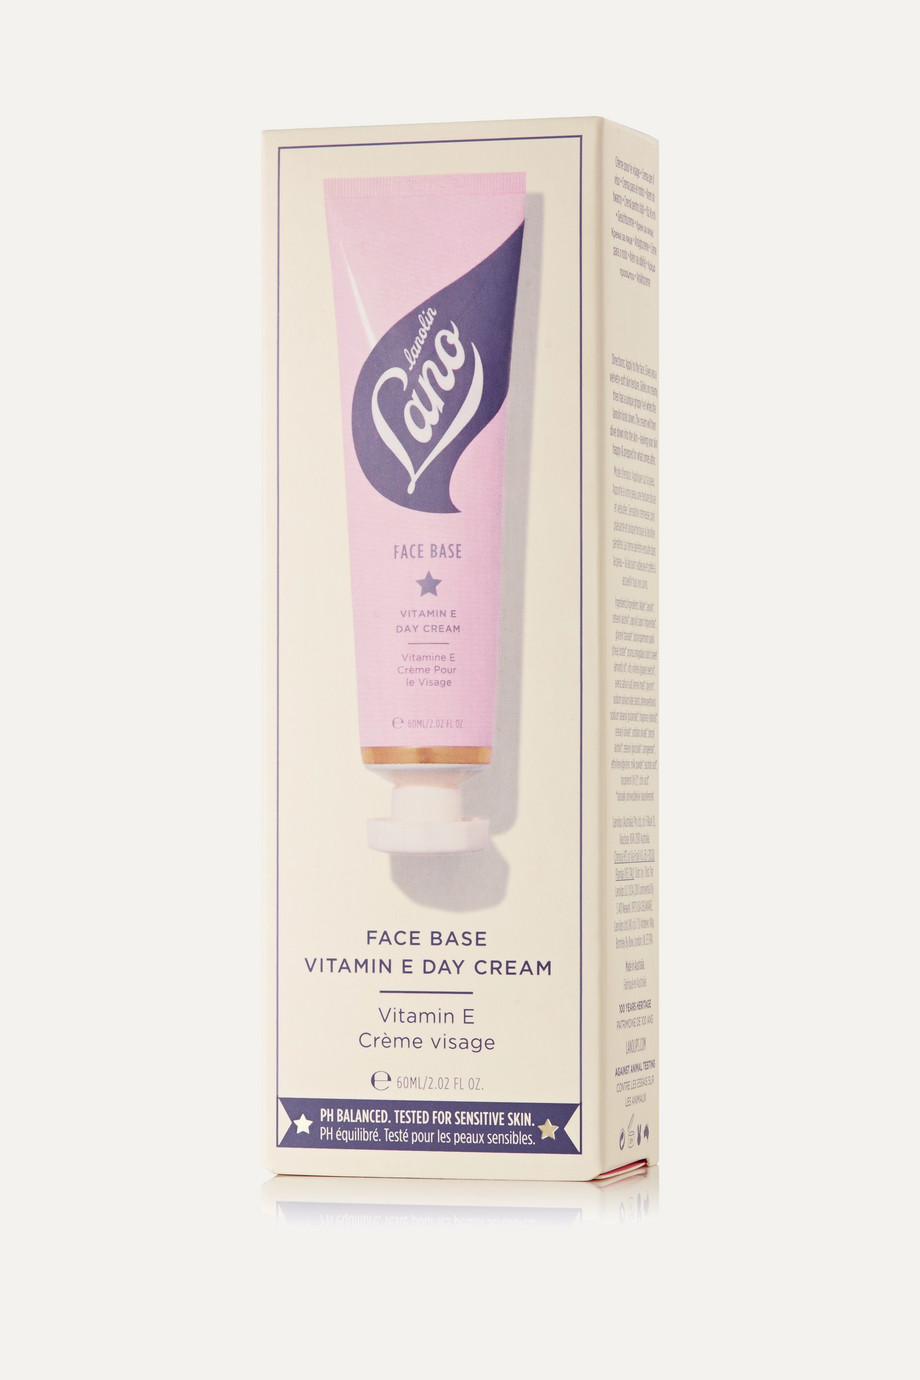 Lano - lips hands all over Face Base Vitamin E Day Cream, 60ml